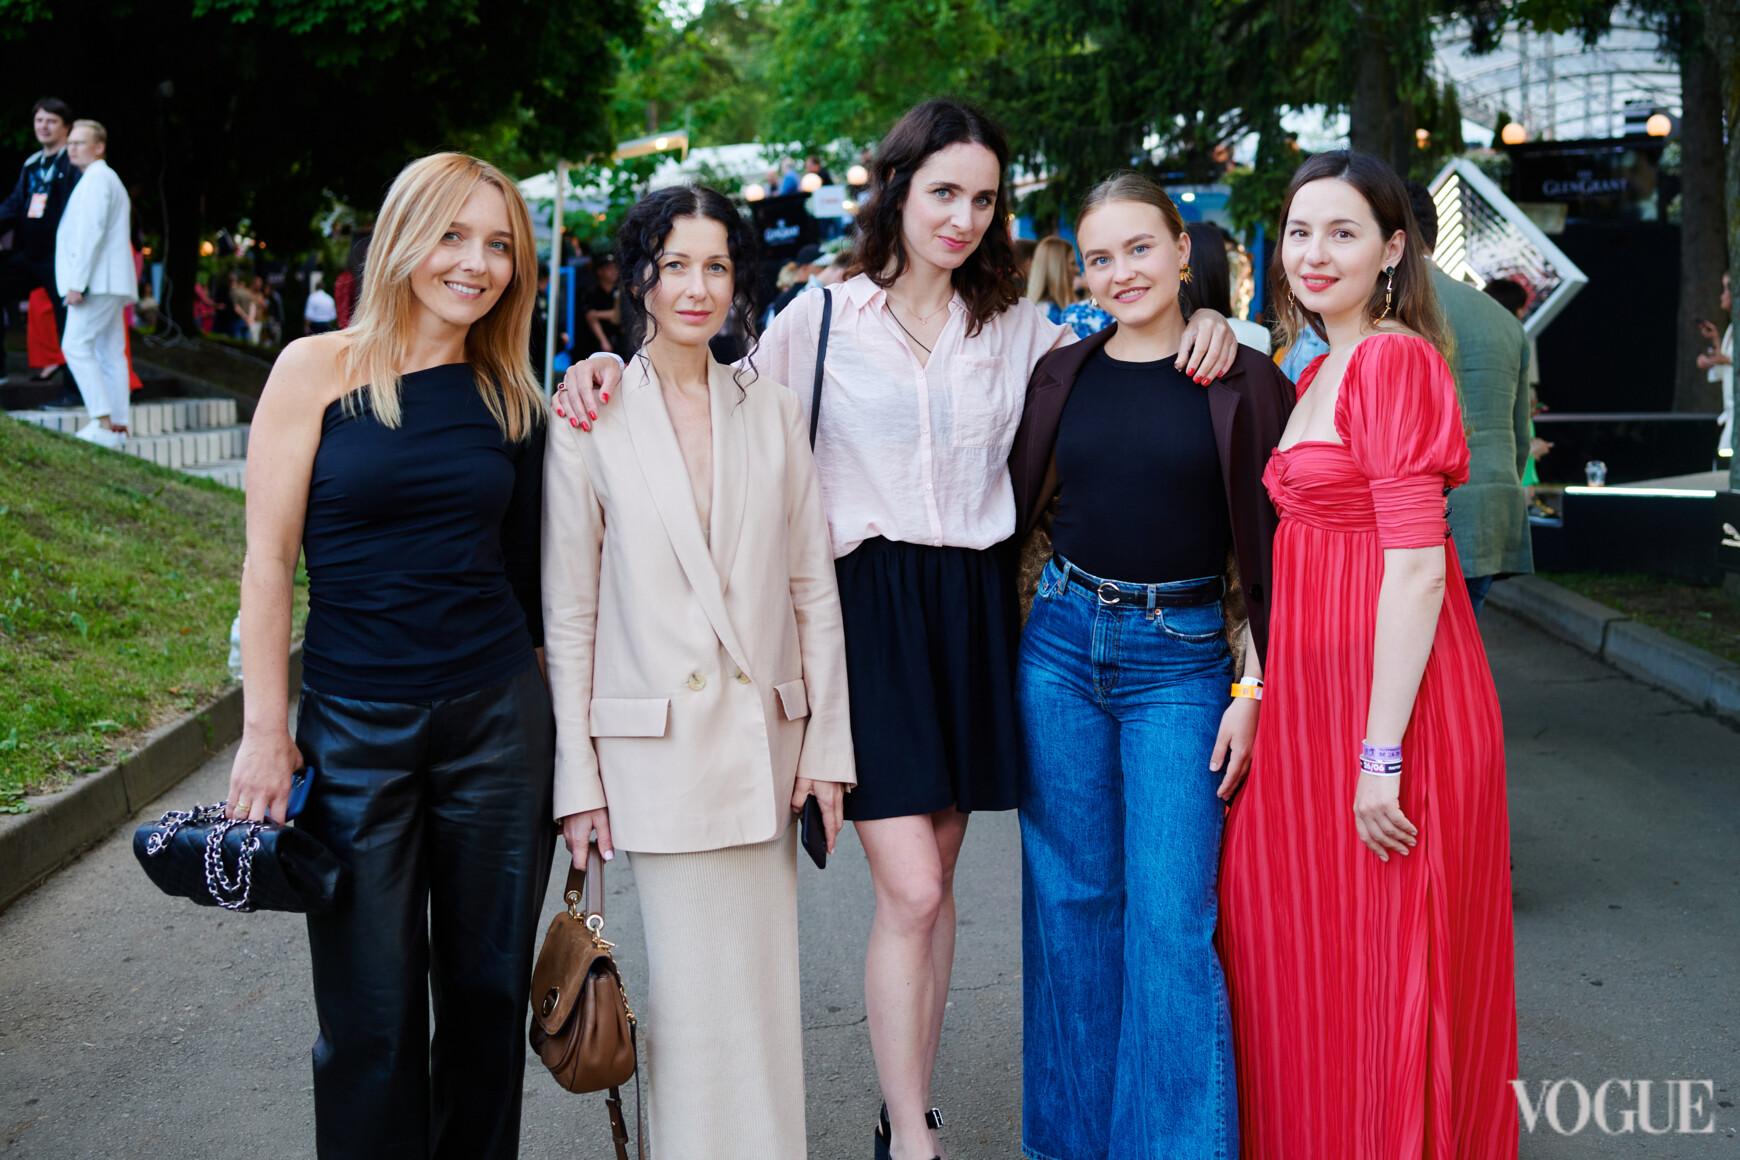 Наталья Бондарчук, Светлана Рощук, Ксения Шагова, Дарья Благовисна и Виолетта Федорова